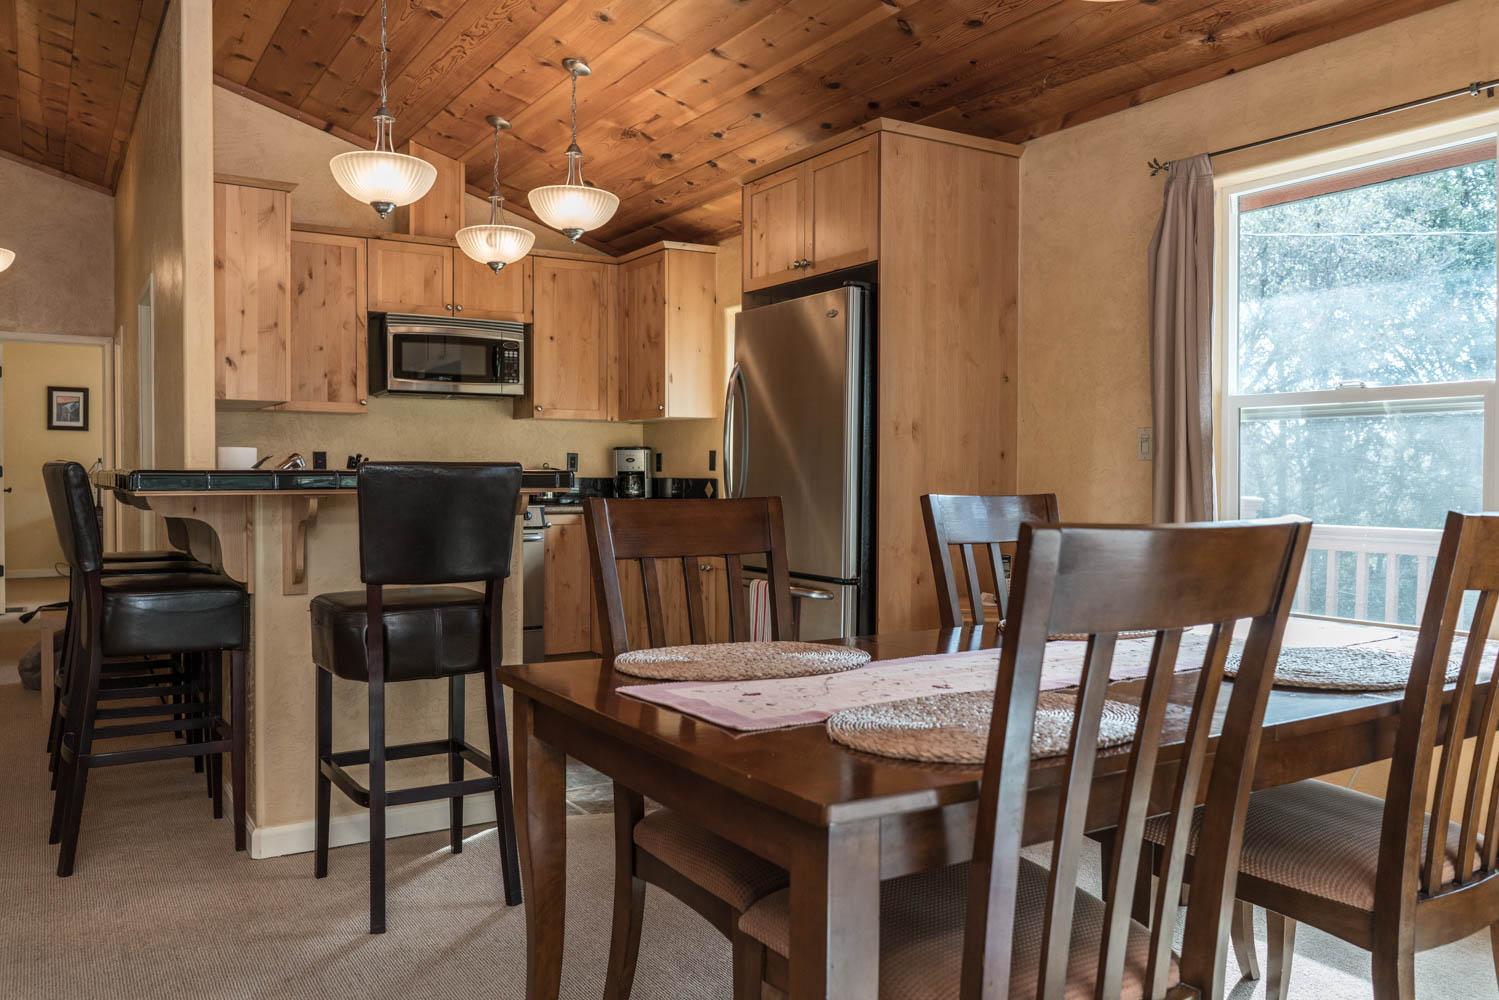 WisdomRetreat-kitchen-A7-9.jpg